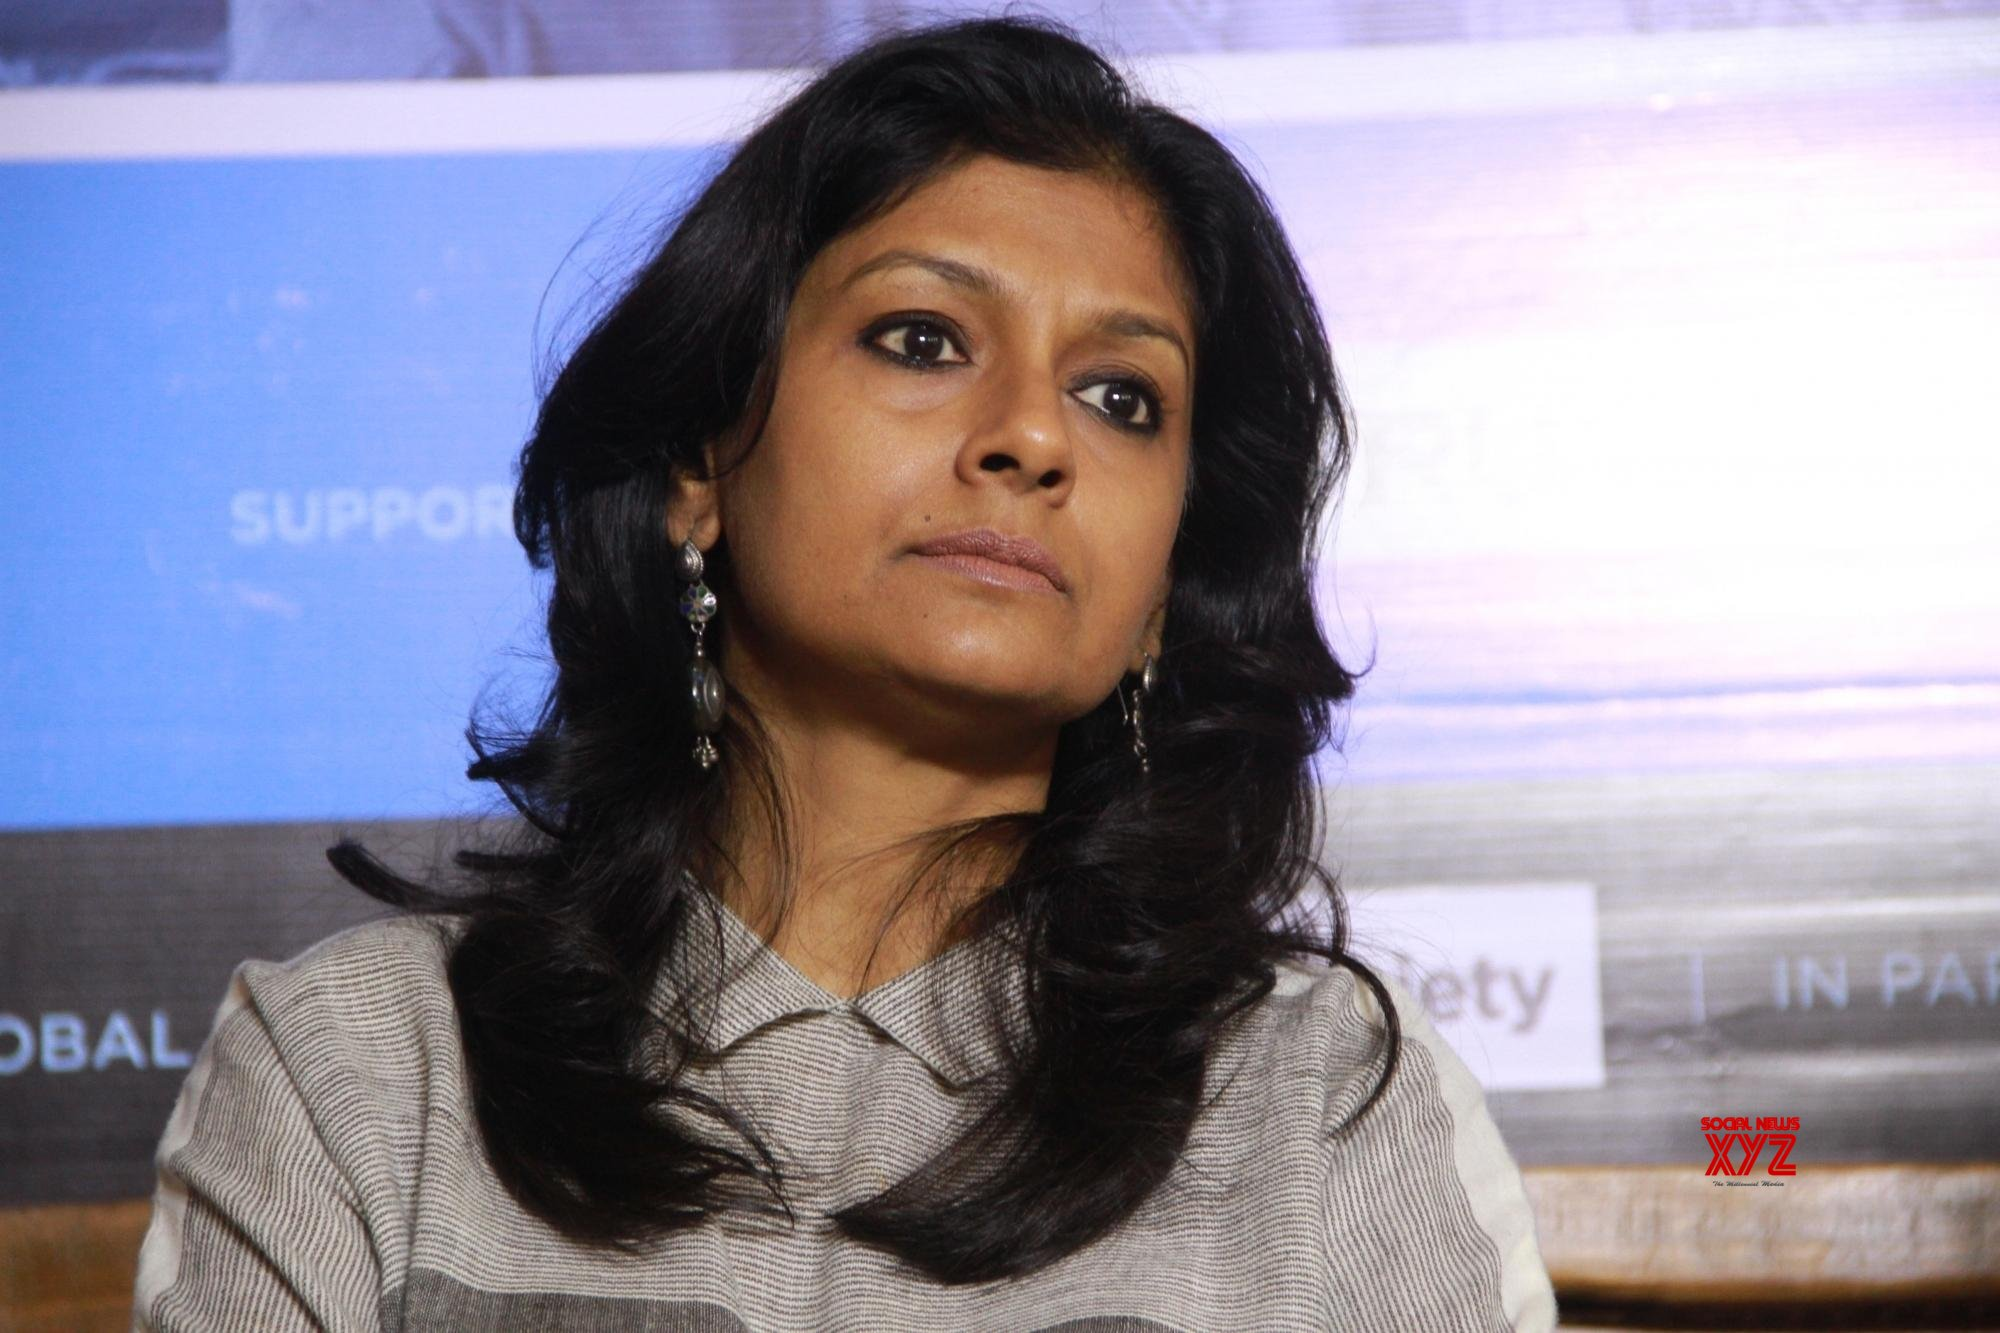 At Lit Fest, actress Nandita Das opposes CAA, NRC